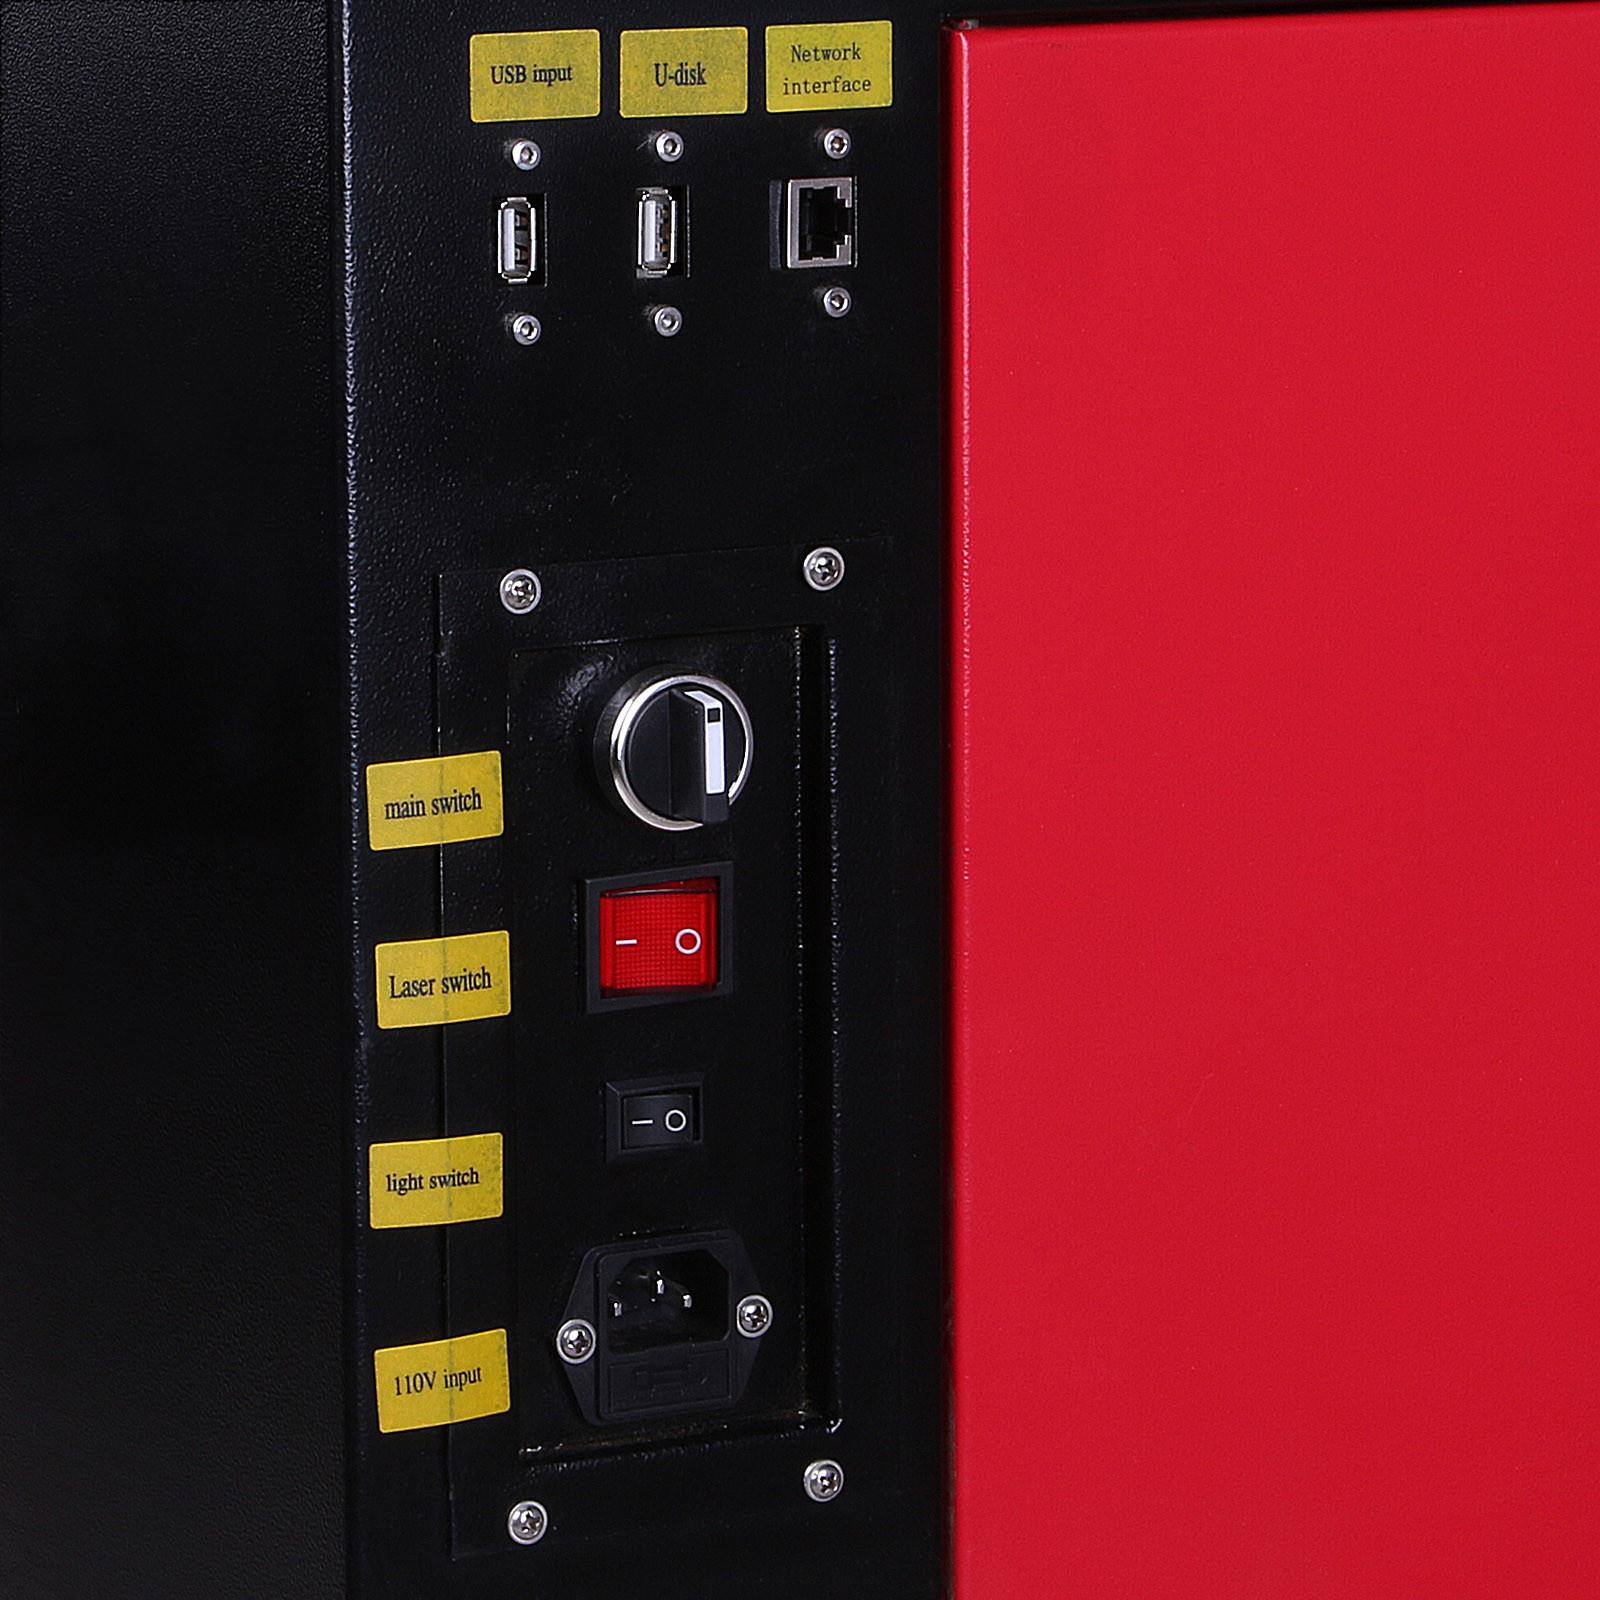 Macchina-per-Incisione-Laser-CO2-40-130W-Asse-Rotante-Tagliatrice-Incisore miniatura 79